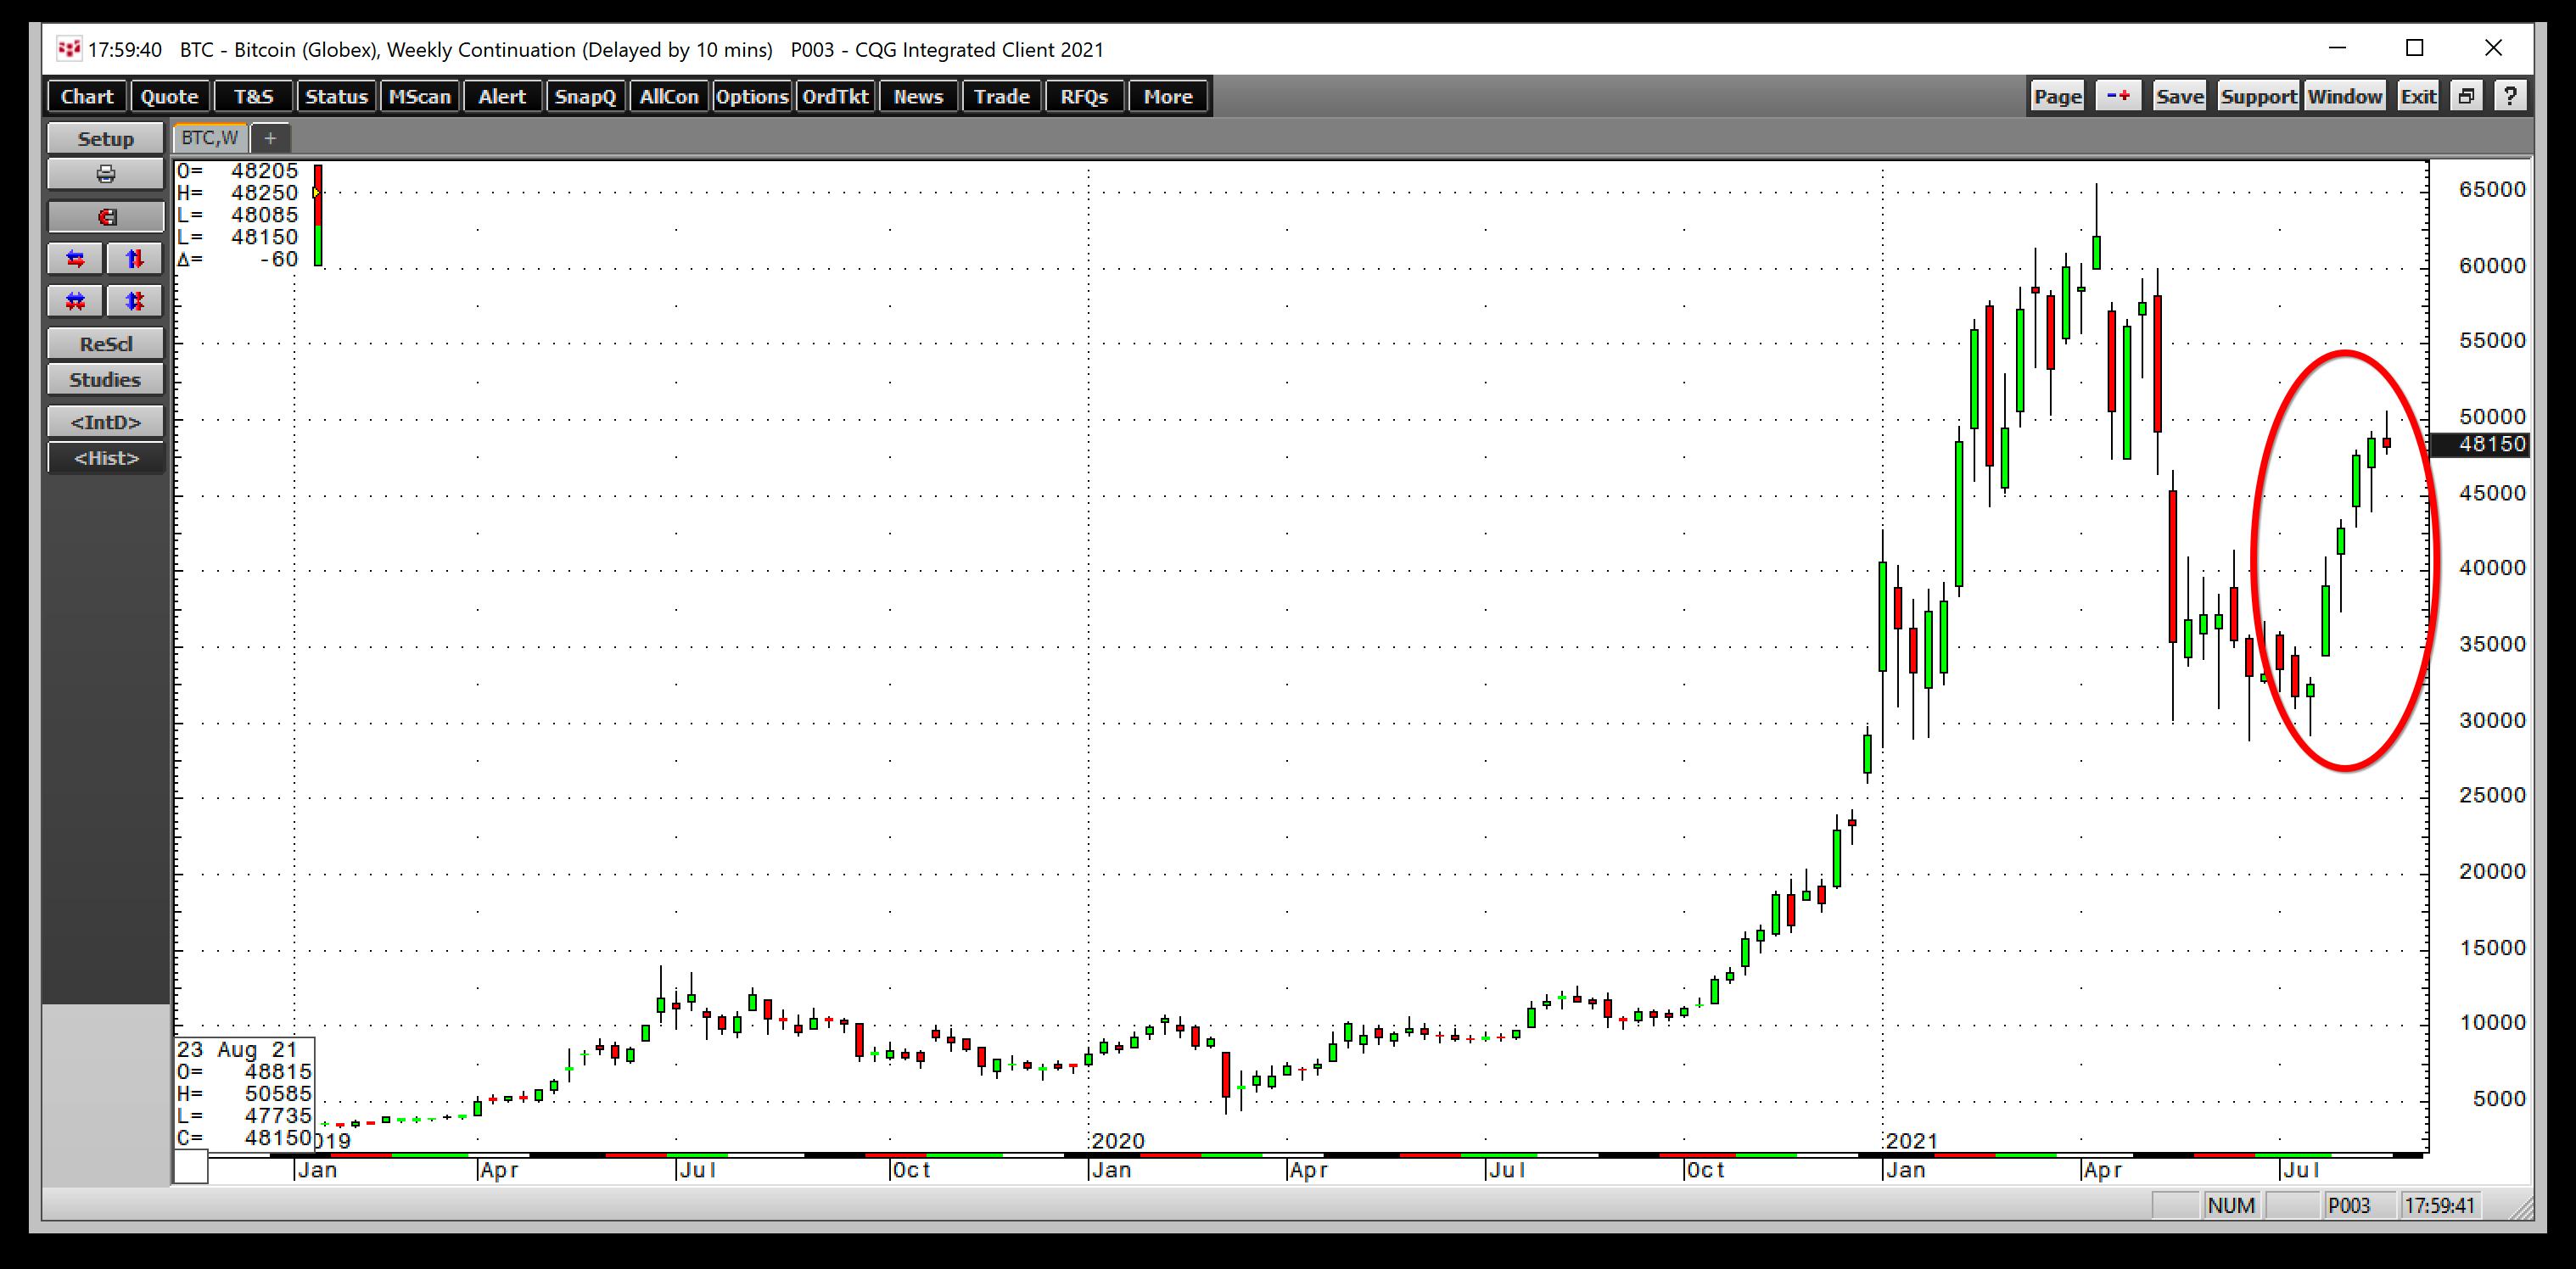 BTC/USD - gráfico semanal (Fonte: CQG)